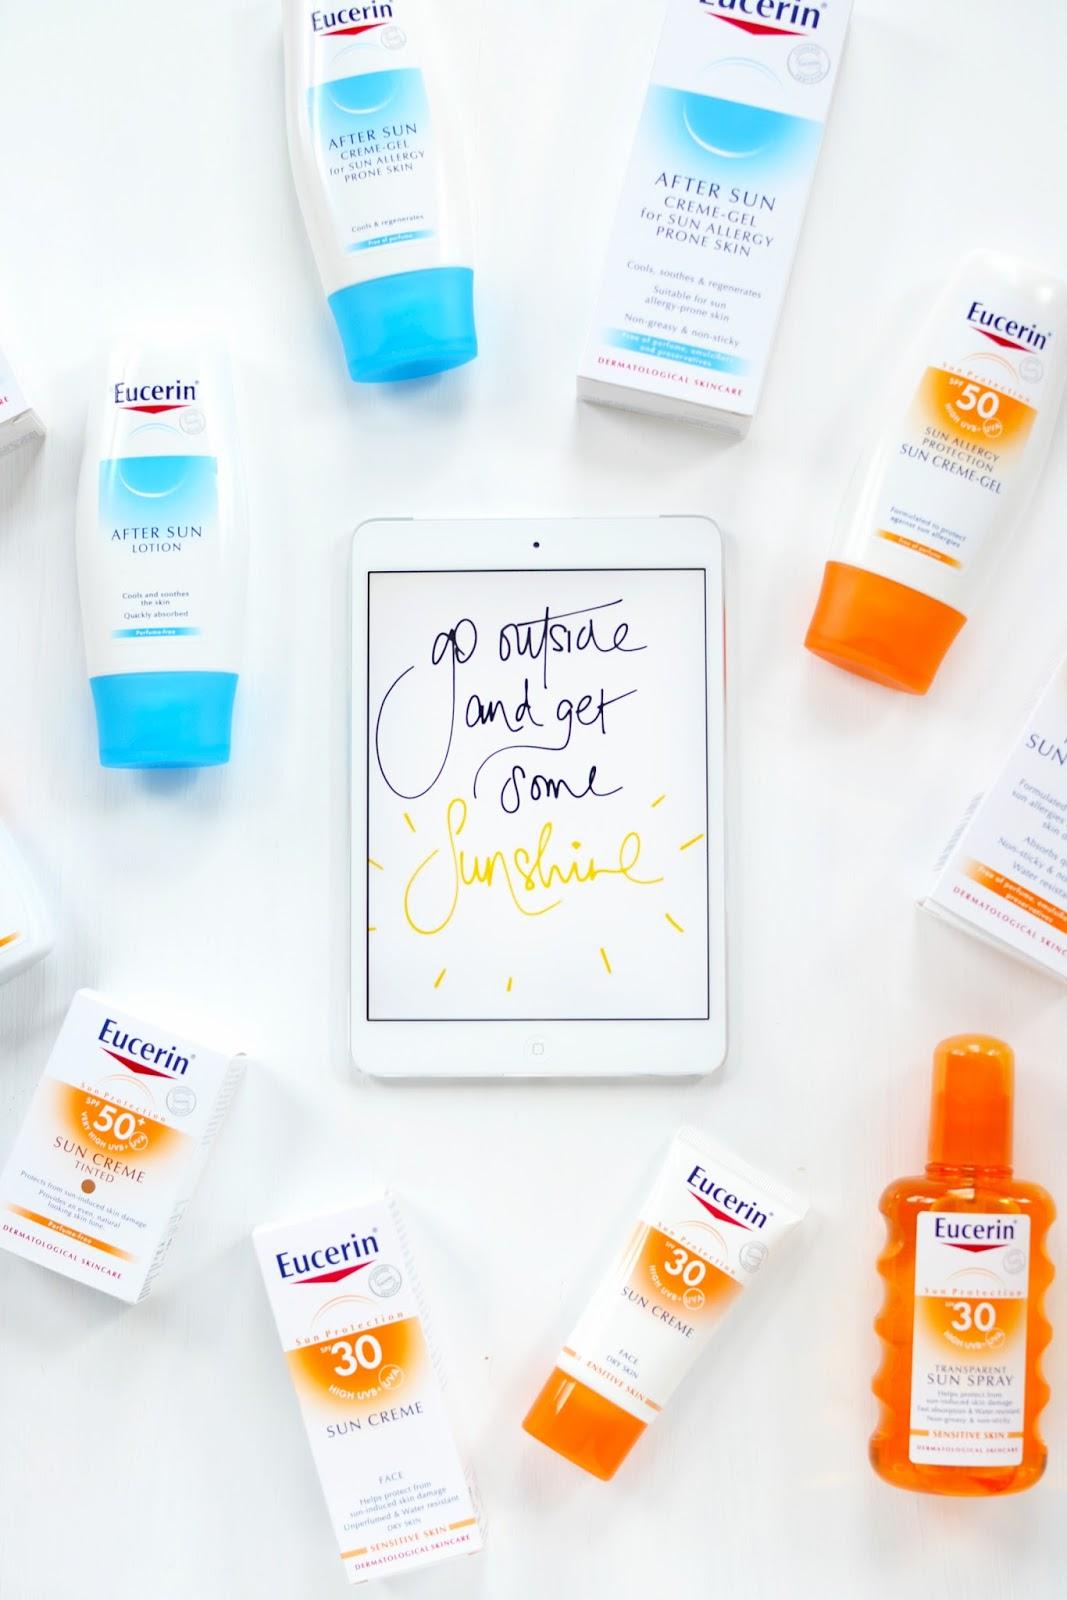 sun care for dry, sensitive skin